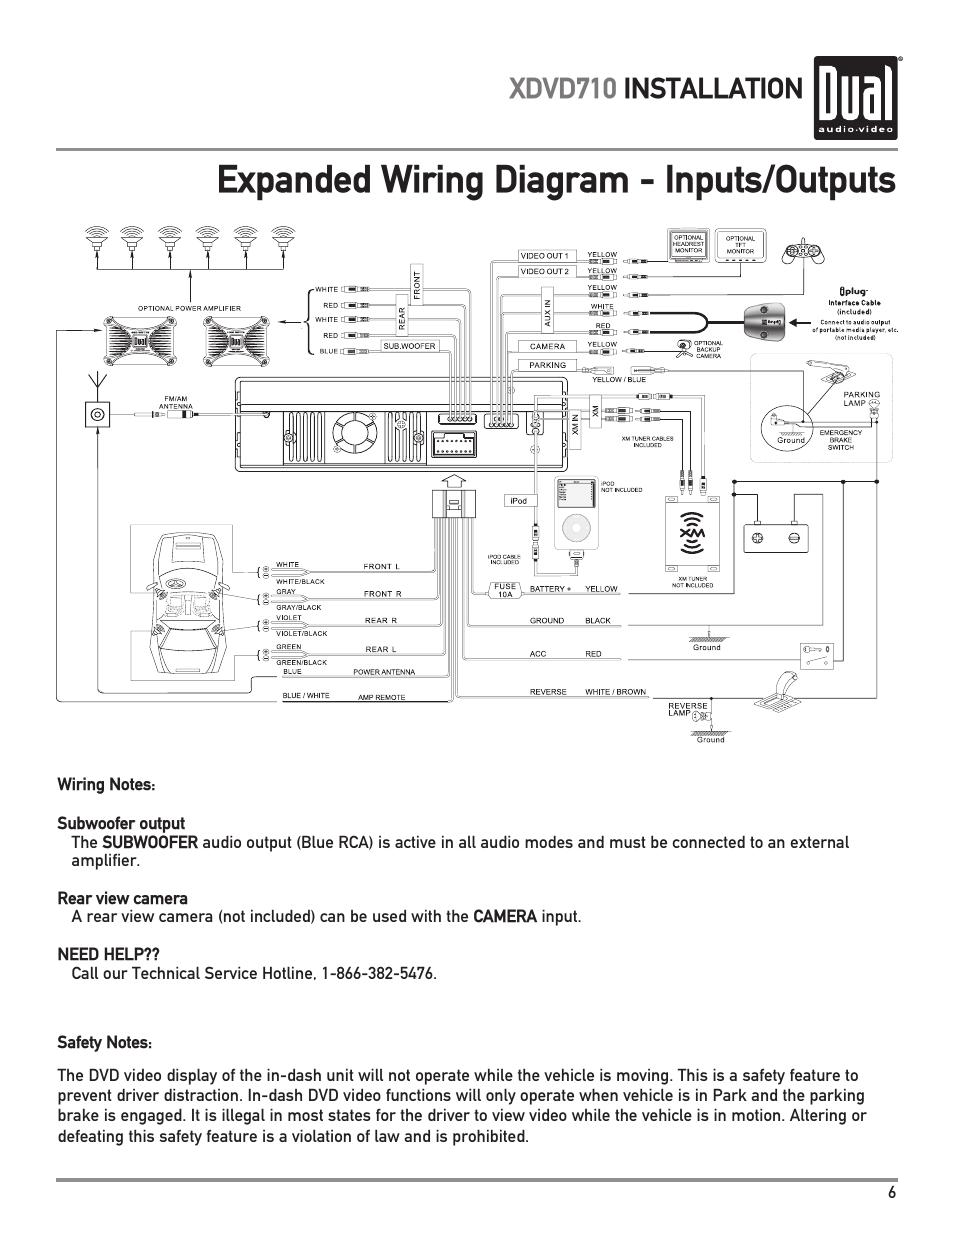 dual xdvd710 page7?resize\\\\\\\=665%2C861 sony xav w1 wiring harness diagram sony car stereo wiring, sony sony xav-w1 wiring harness at edmiracle.co